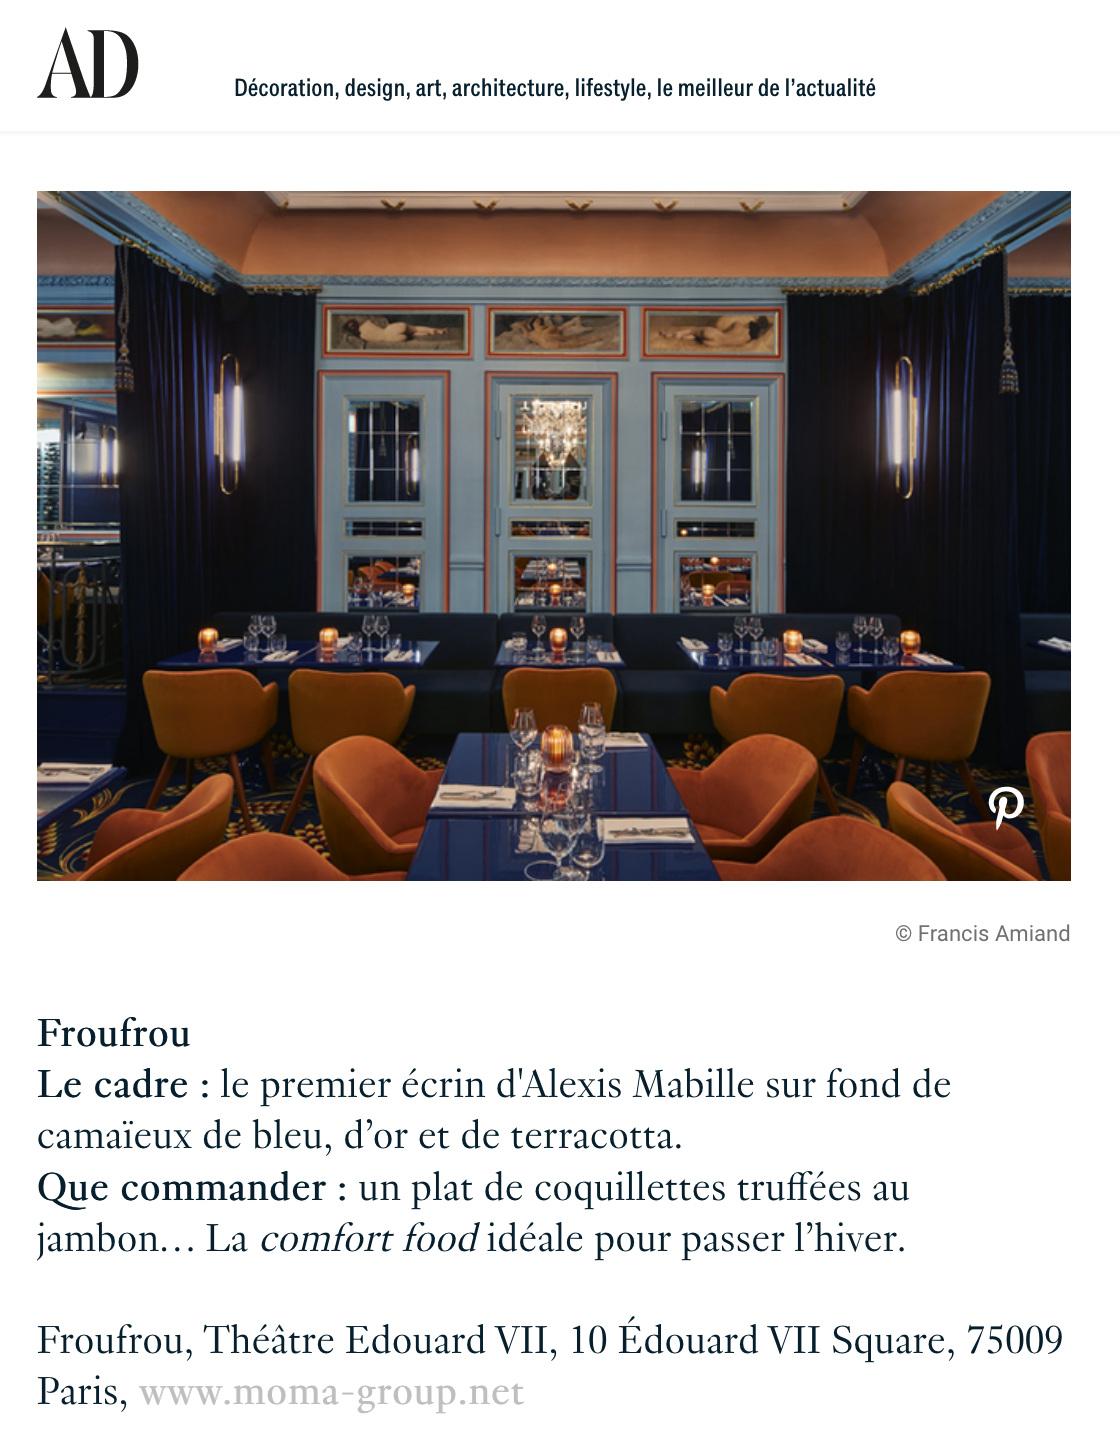 www.admagazine.fr_dec18.png